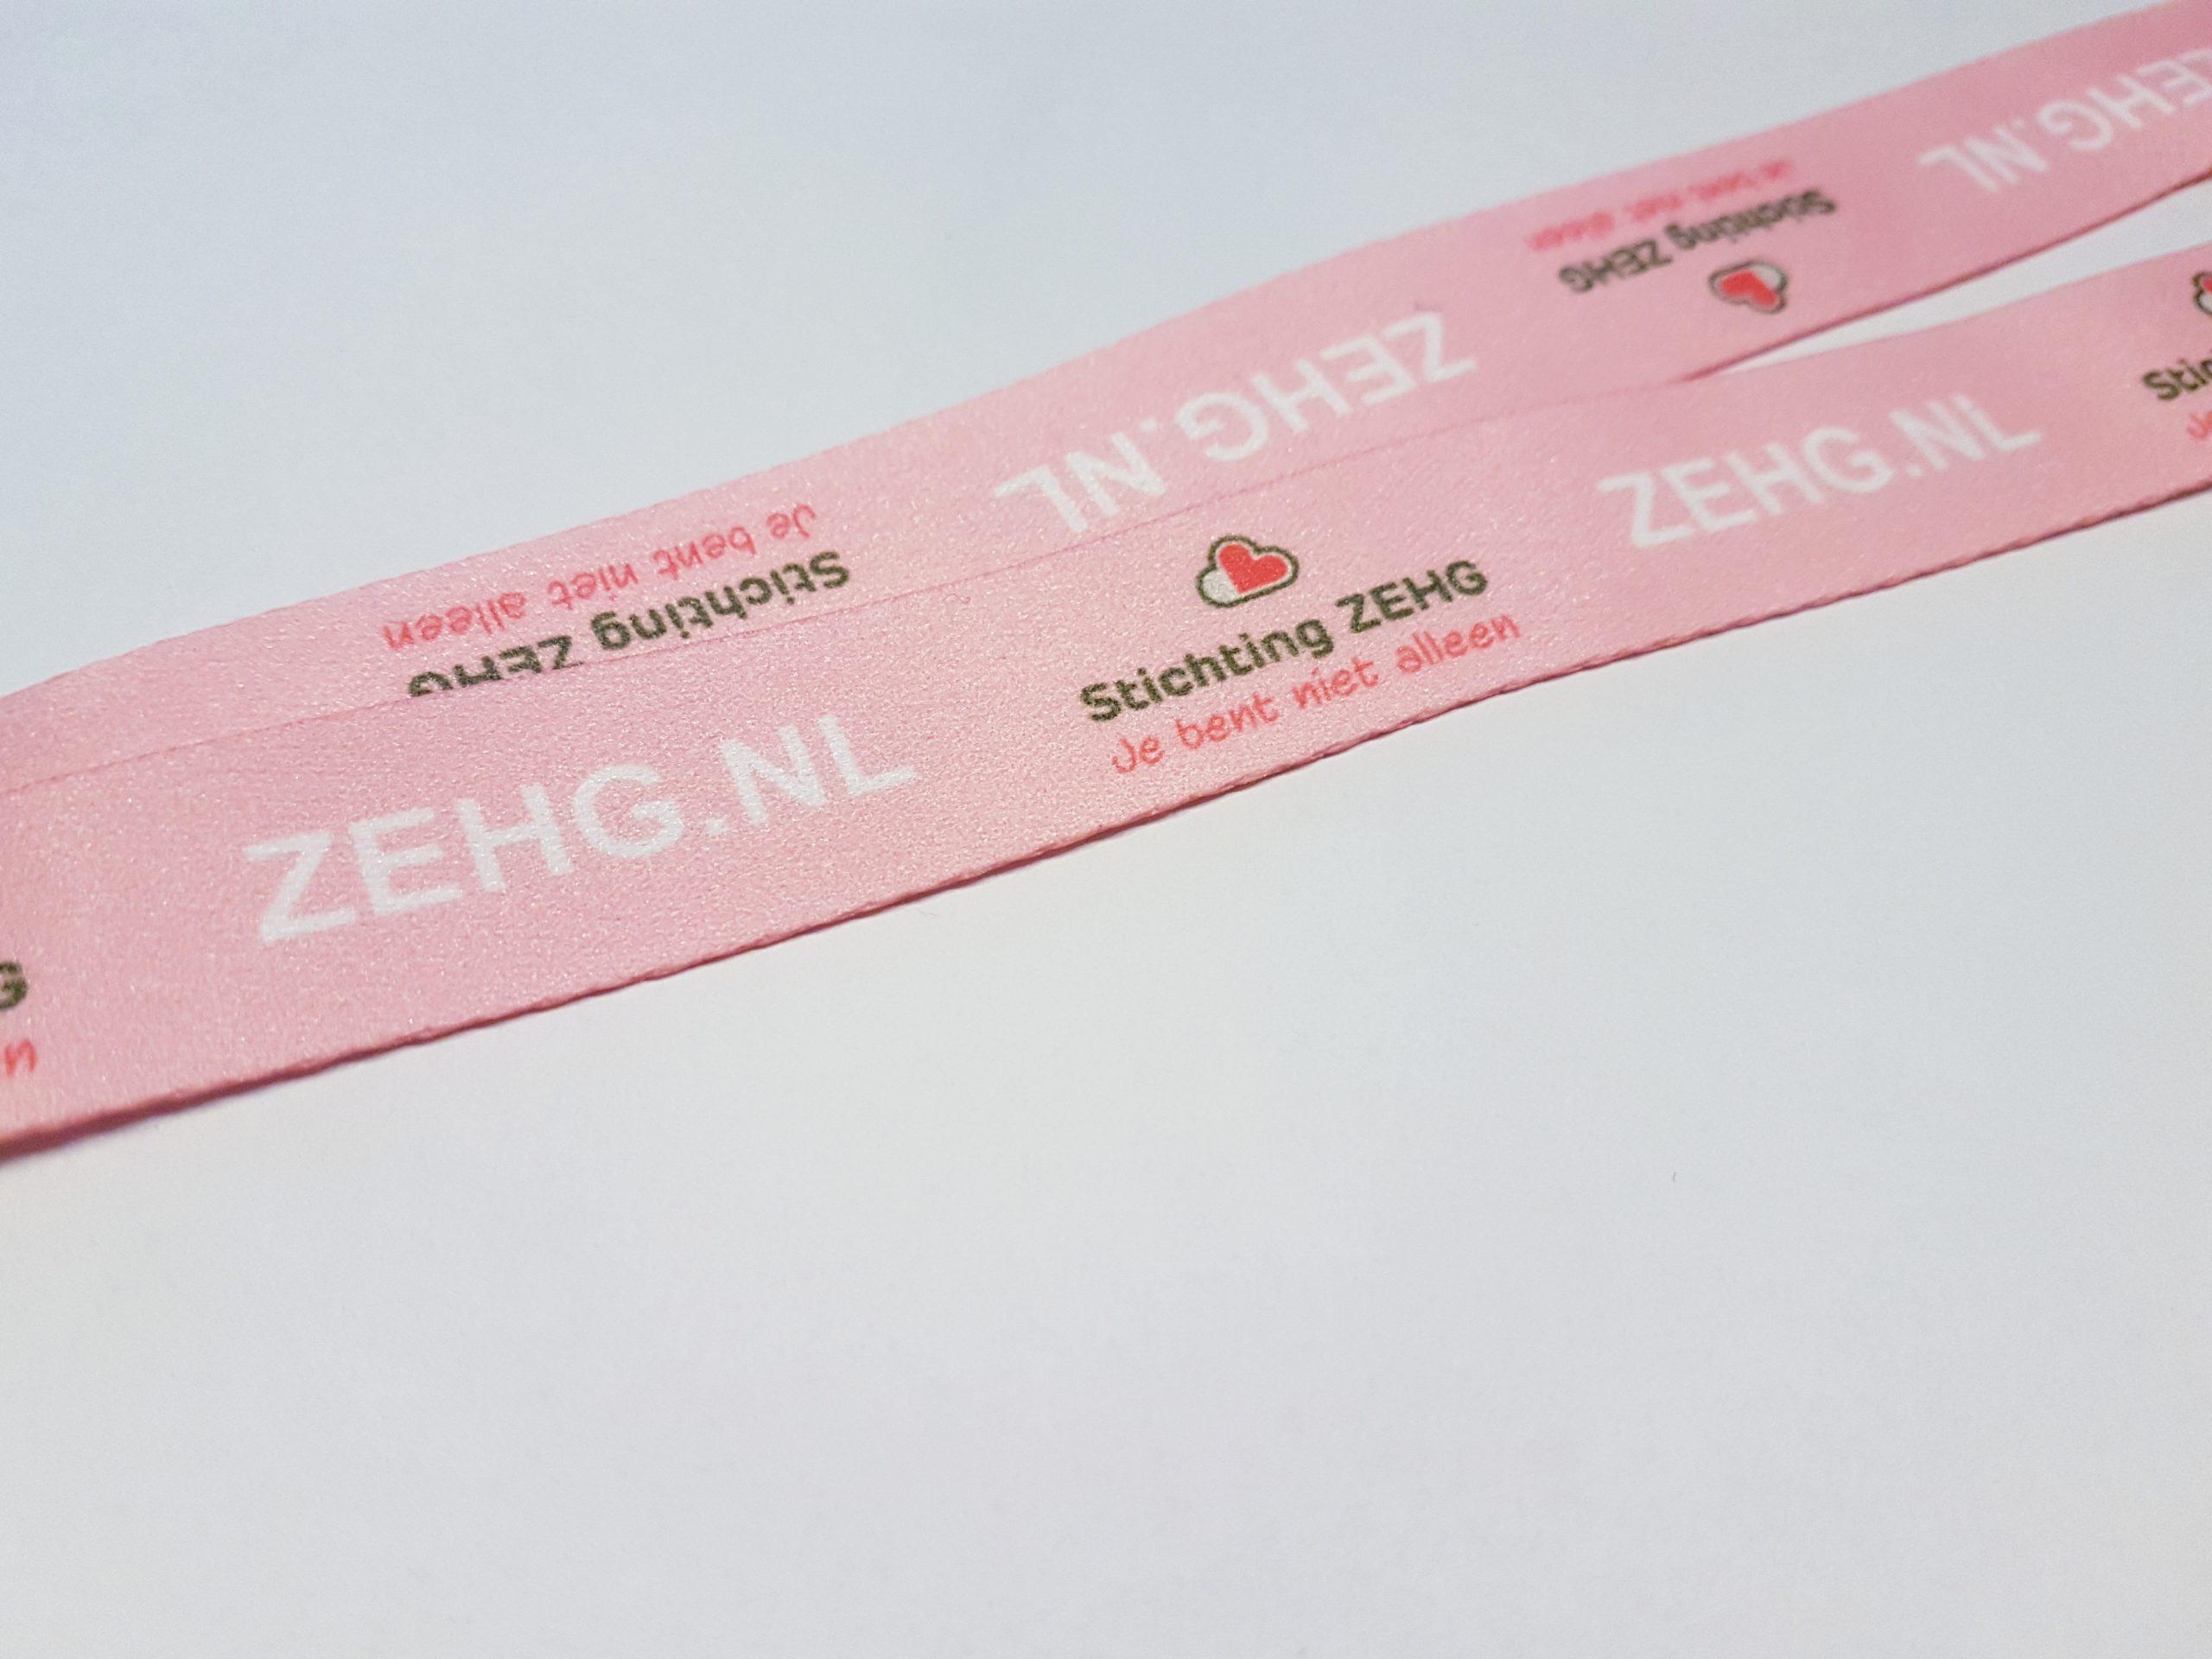 ZEHG Keycord / lanyard